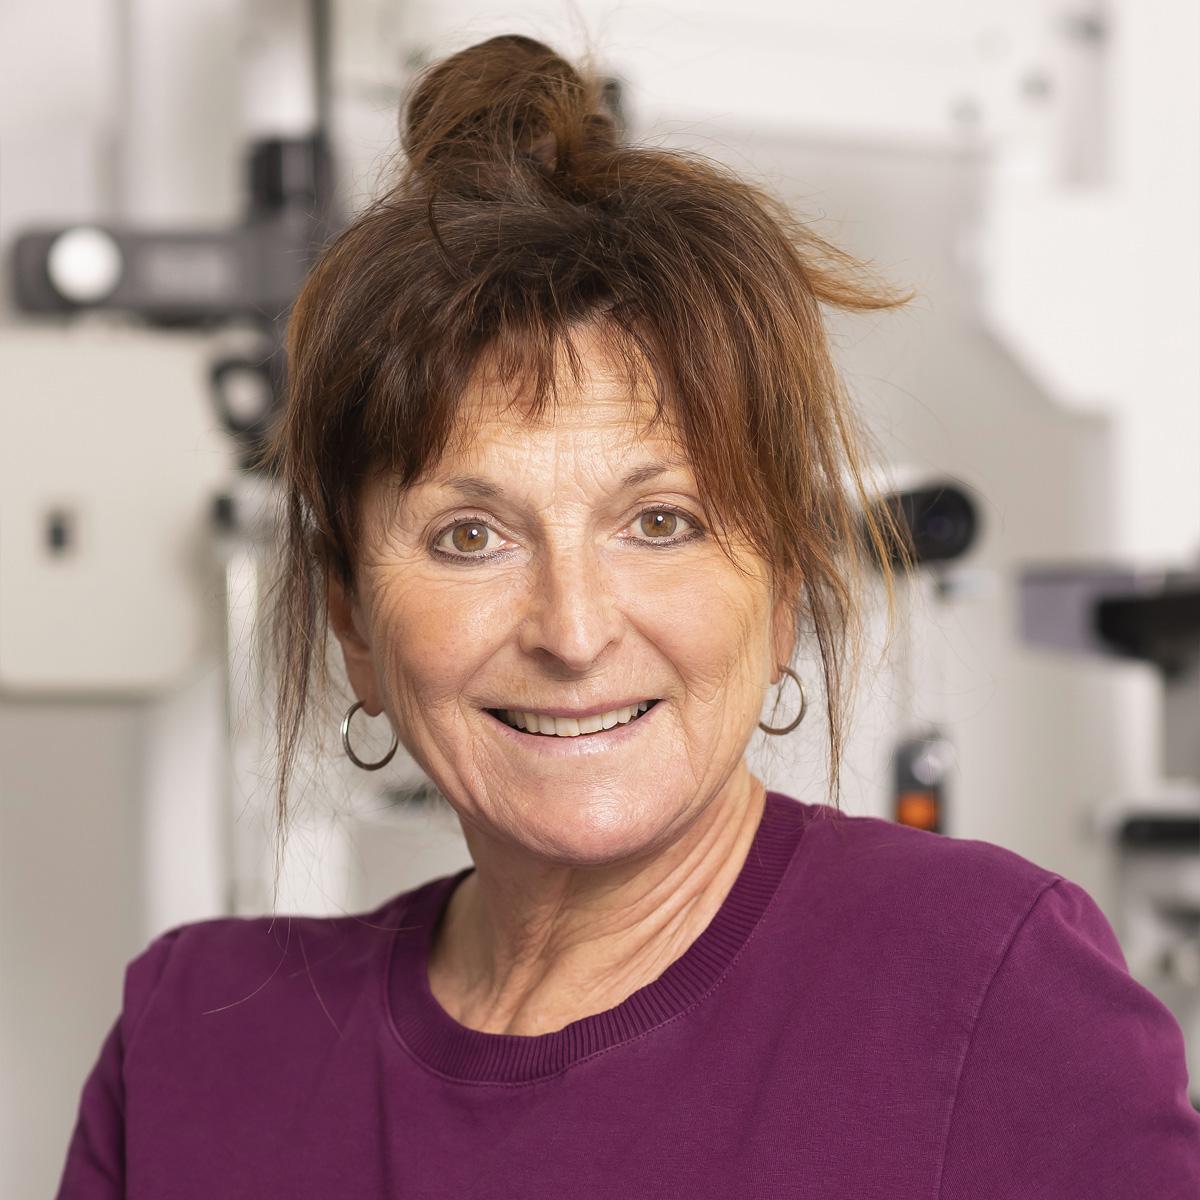 Ingrid Richter